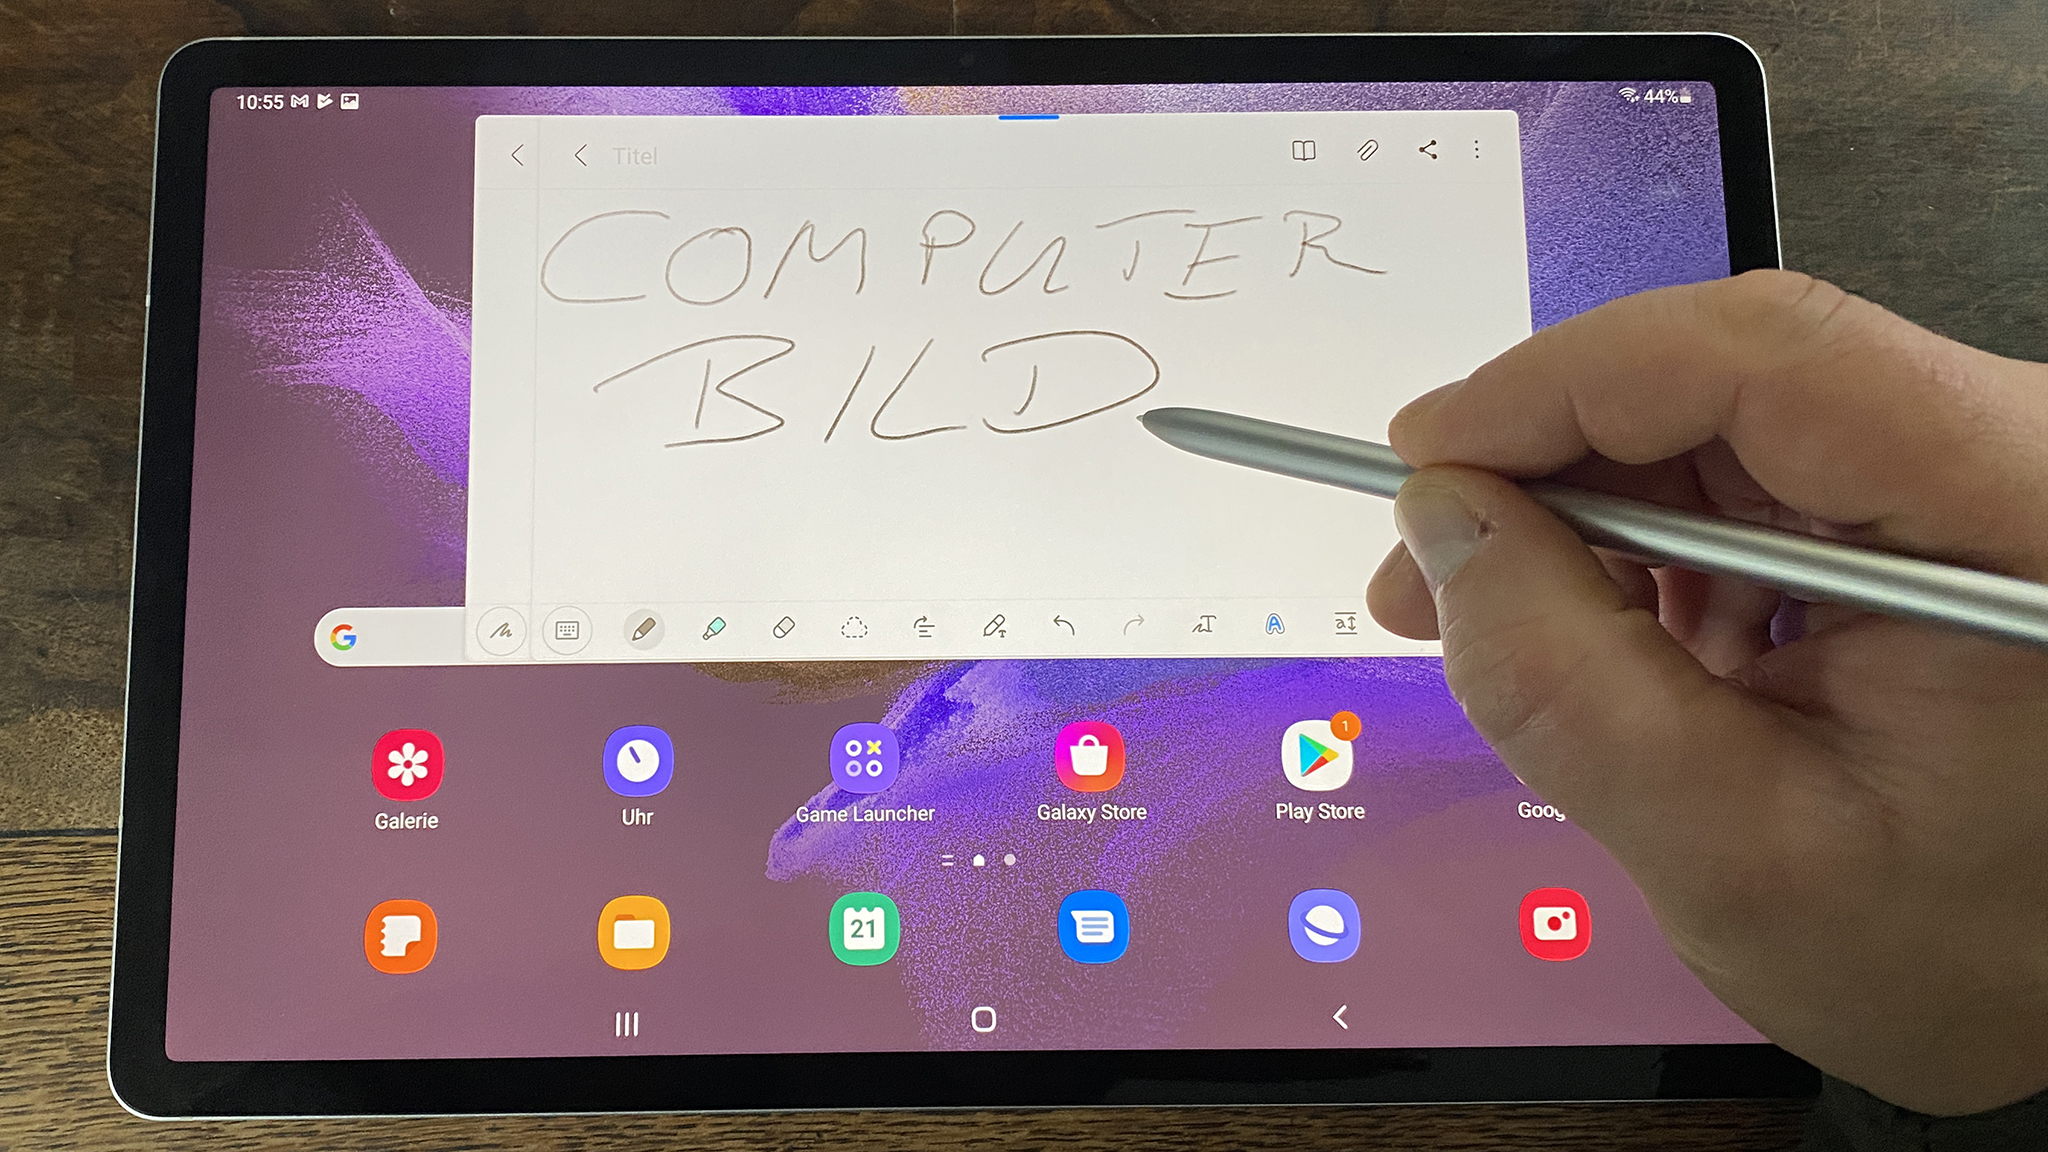 Samsung Galaxy Tab S7 FE Wifi im Test: Günstige WLAN-Version